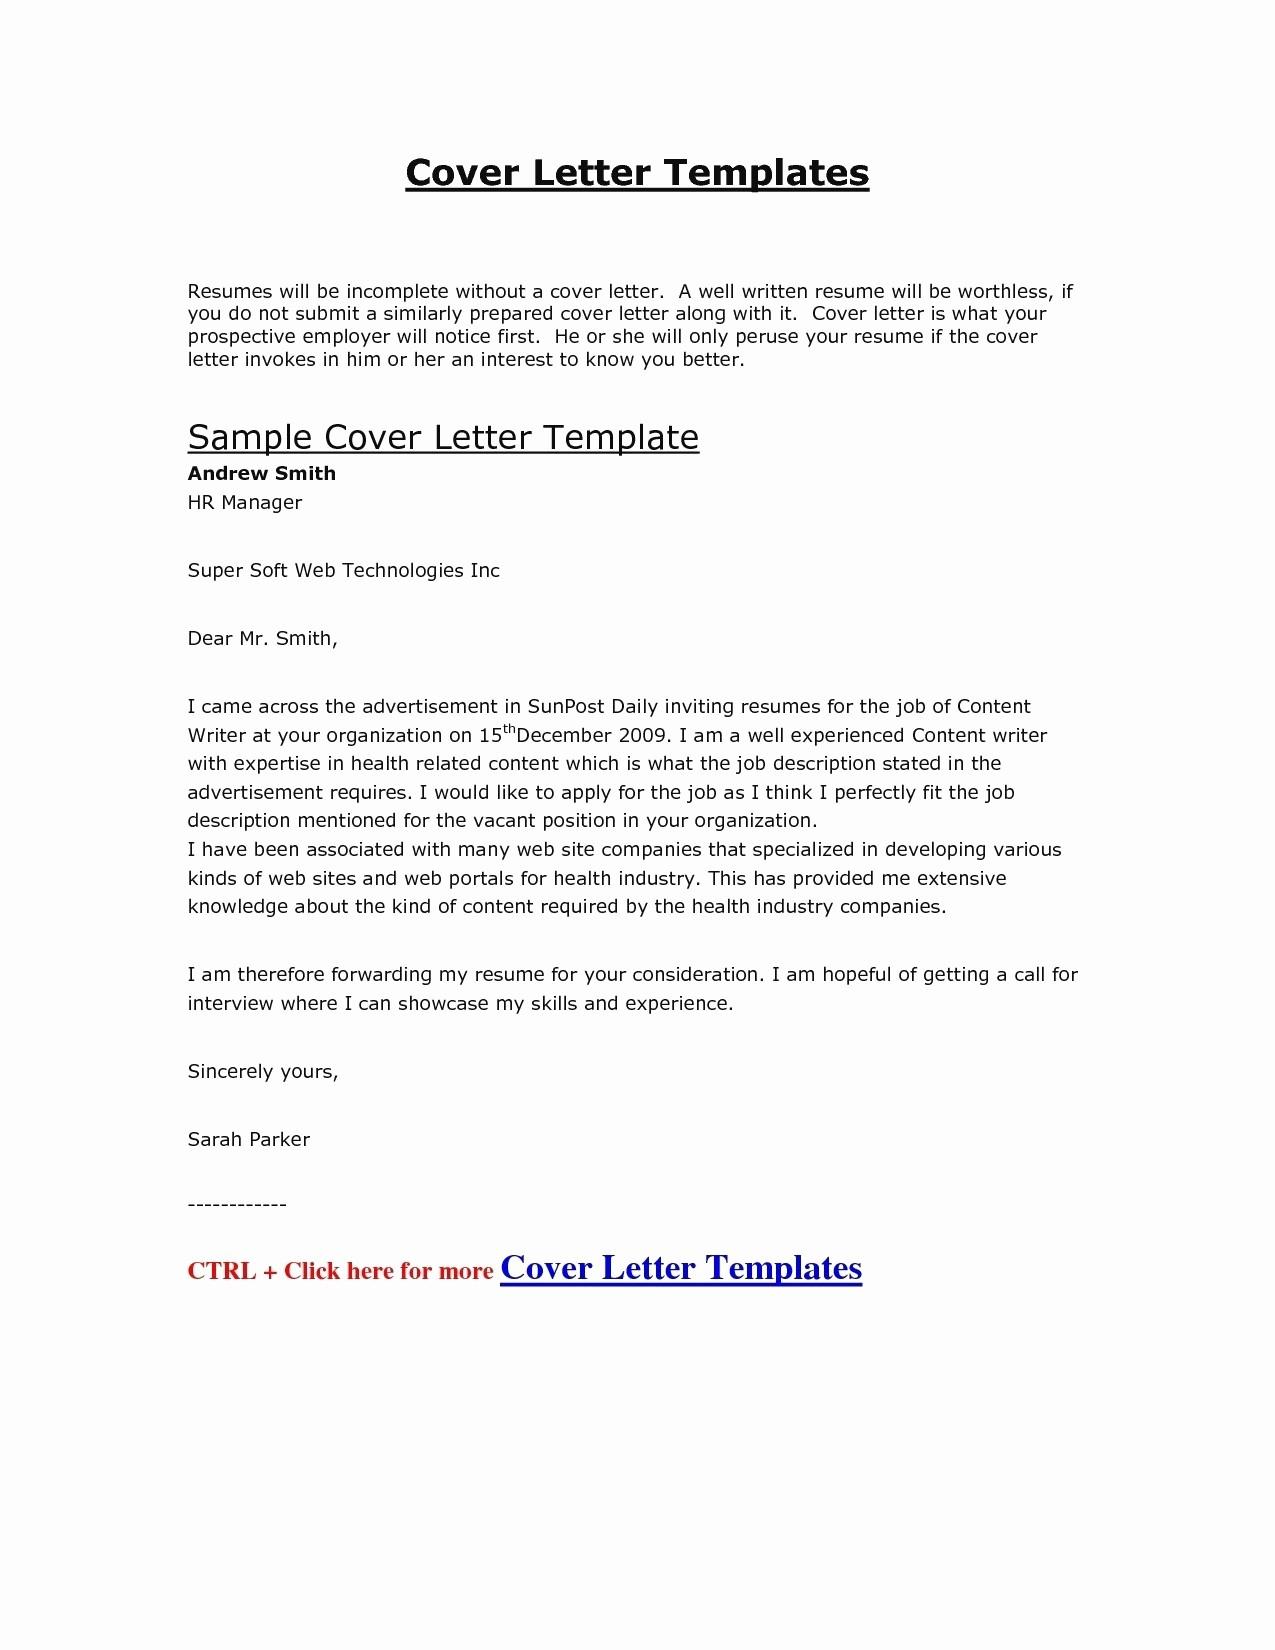 Excellent Cover Letter Template - Job Application Letter format Template Copy Cover Letter Template Hr